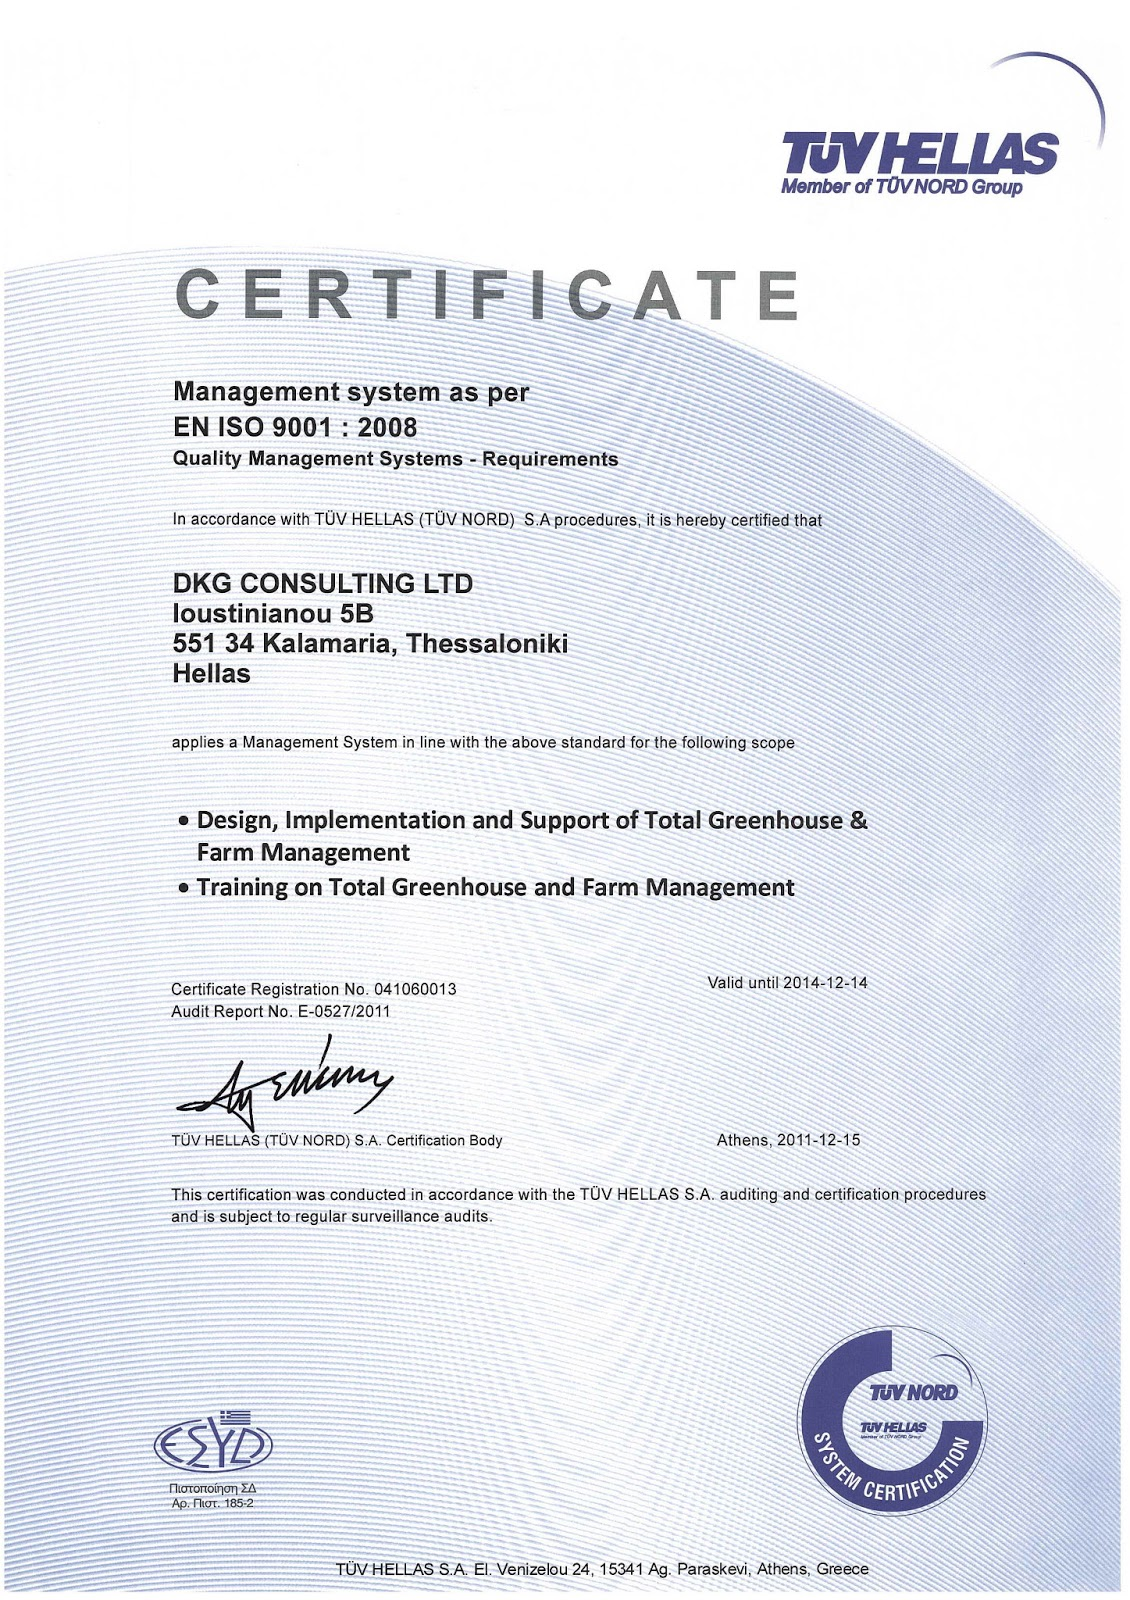 IRTC : Certifications